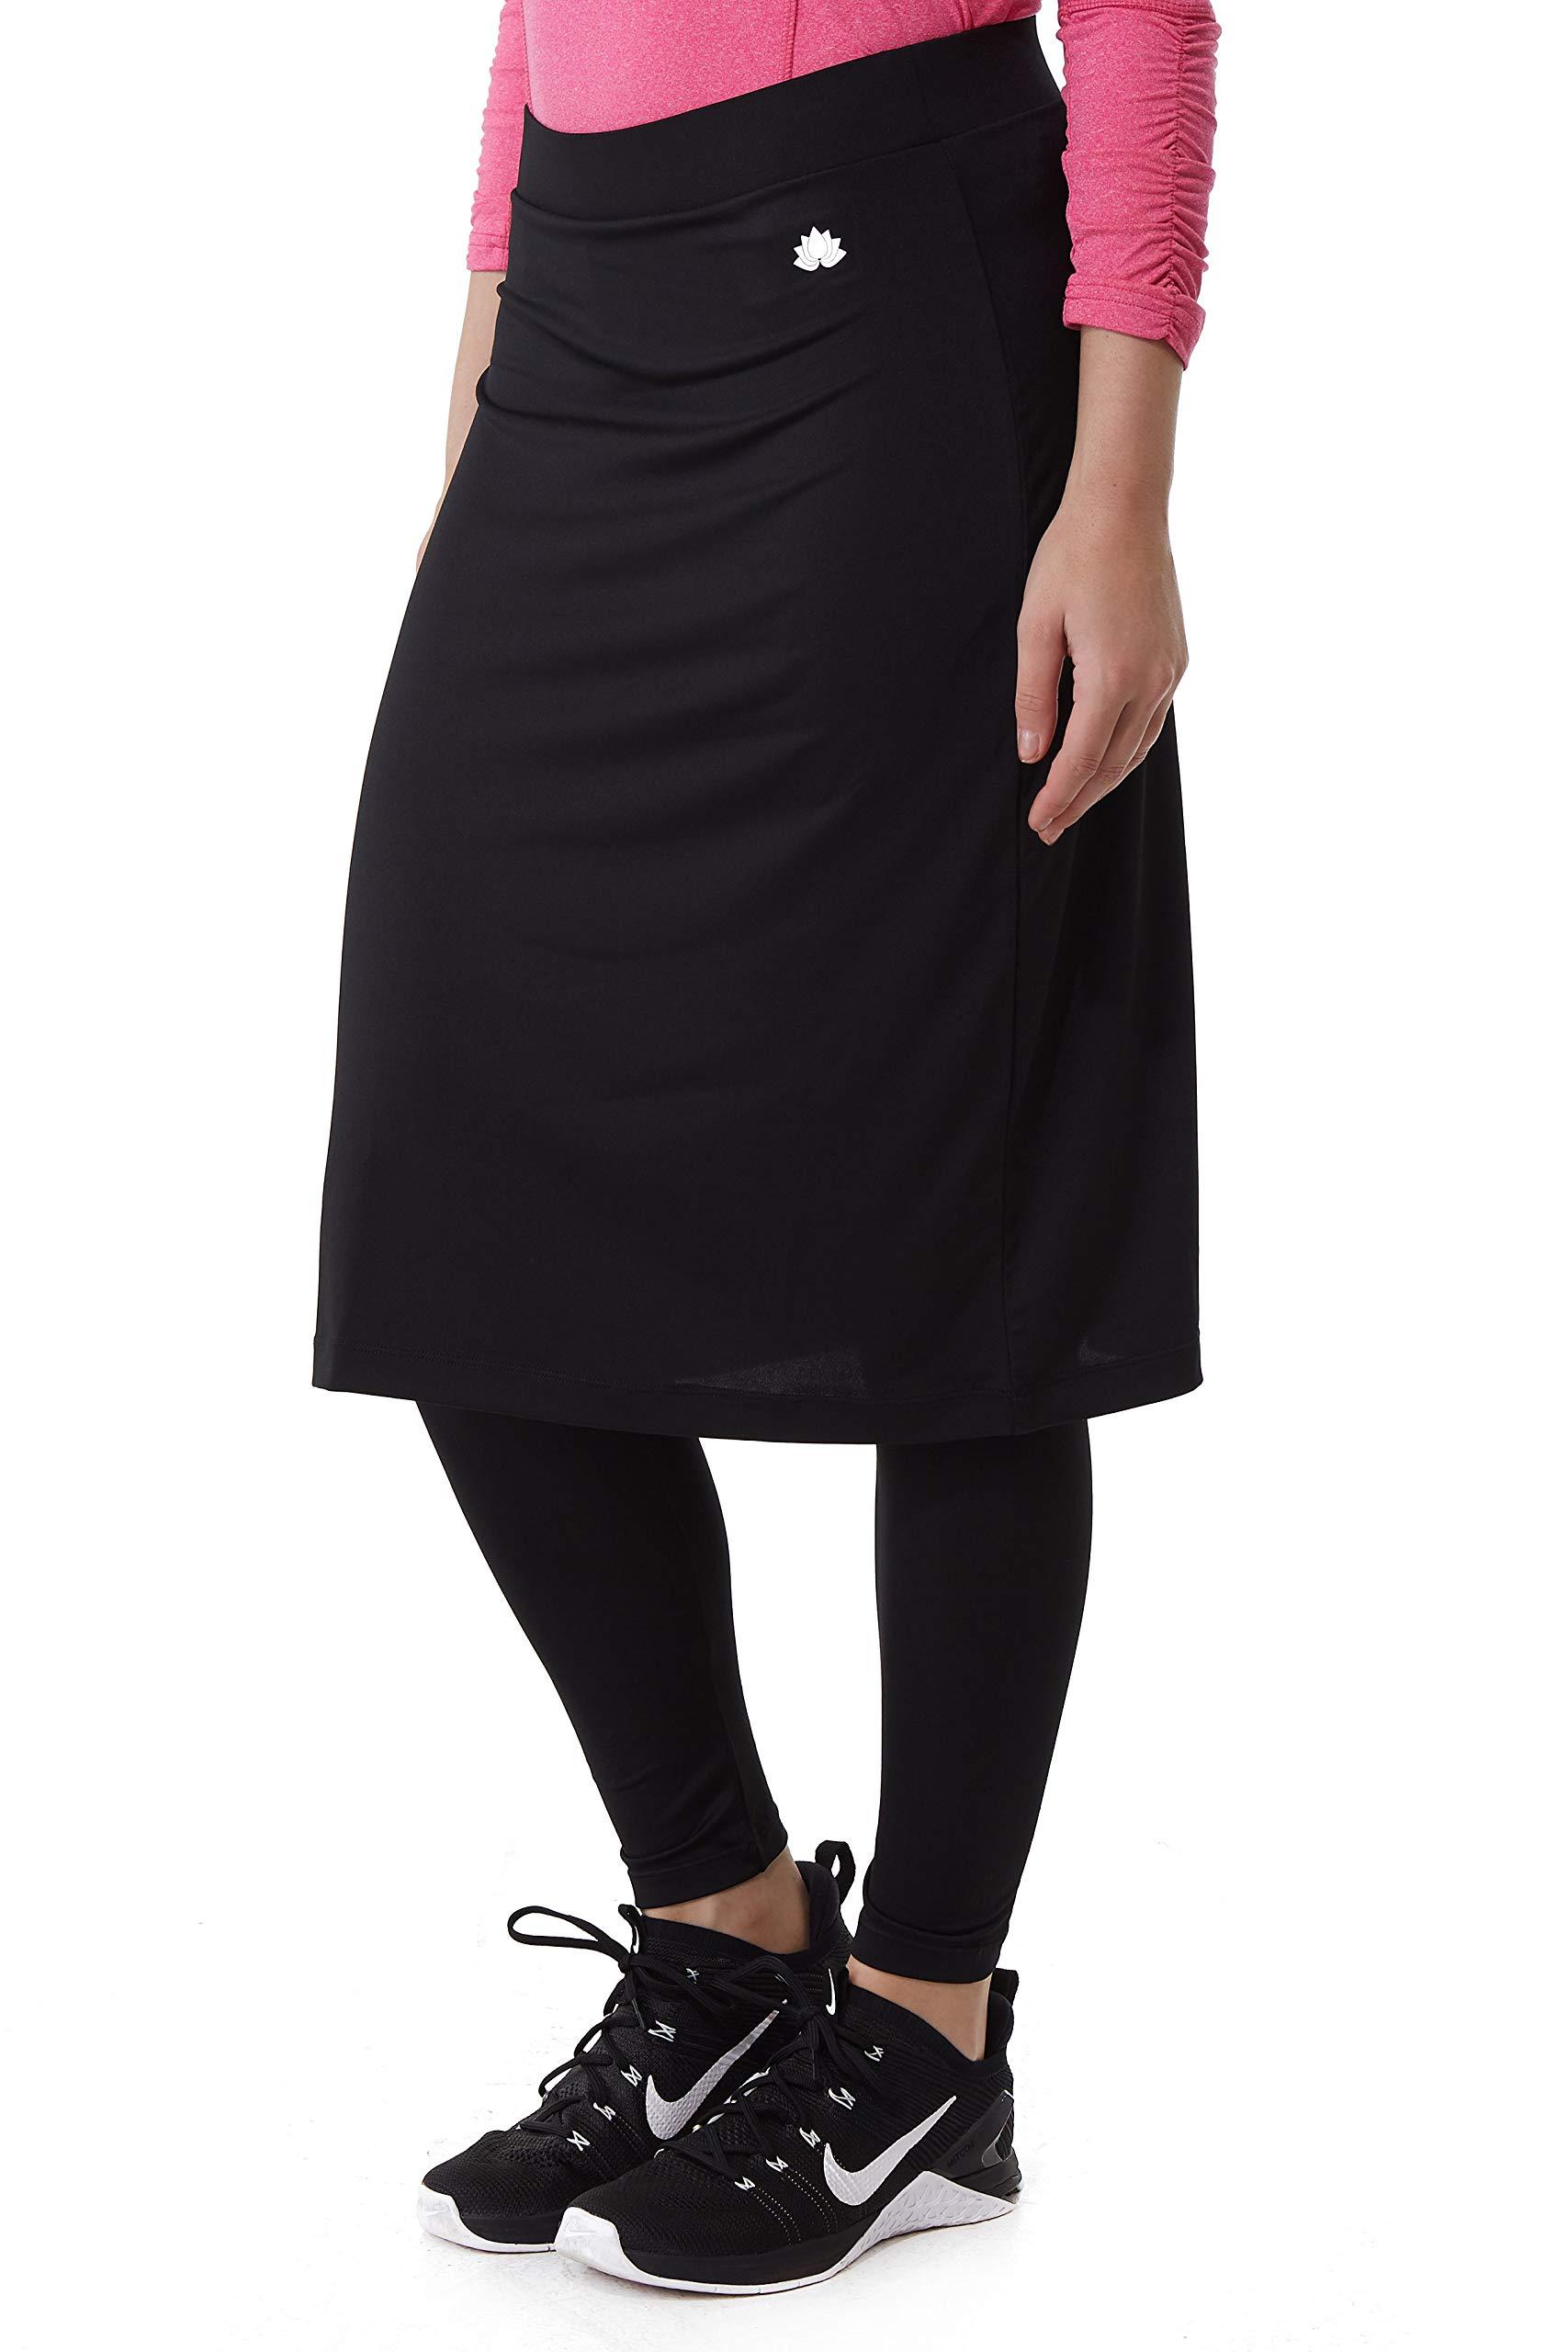 Snoga Athletics Active Midi Skirt with Ankle-Length Leggings - Black, XS